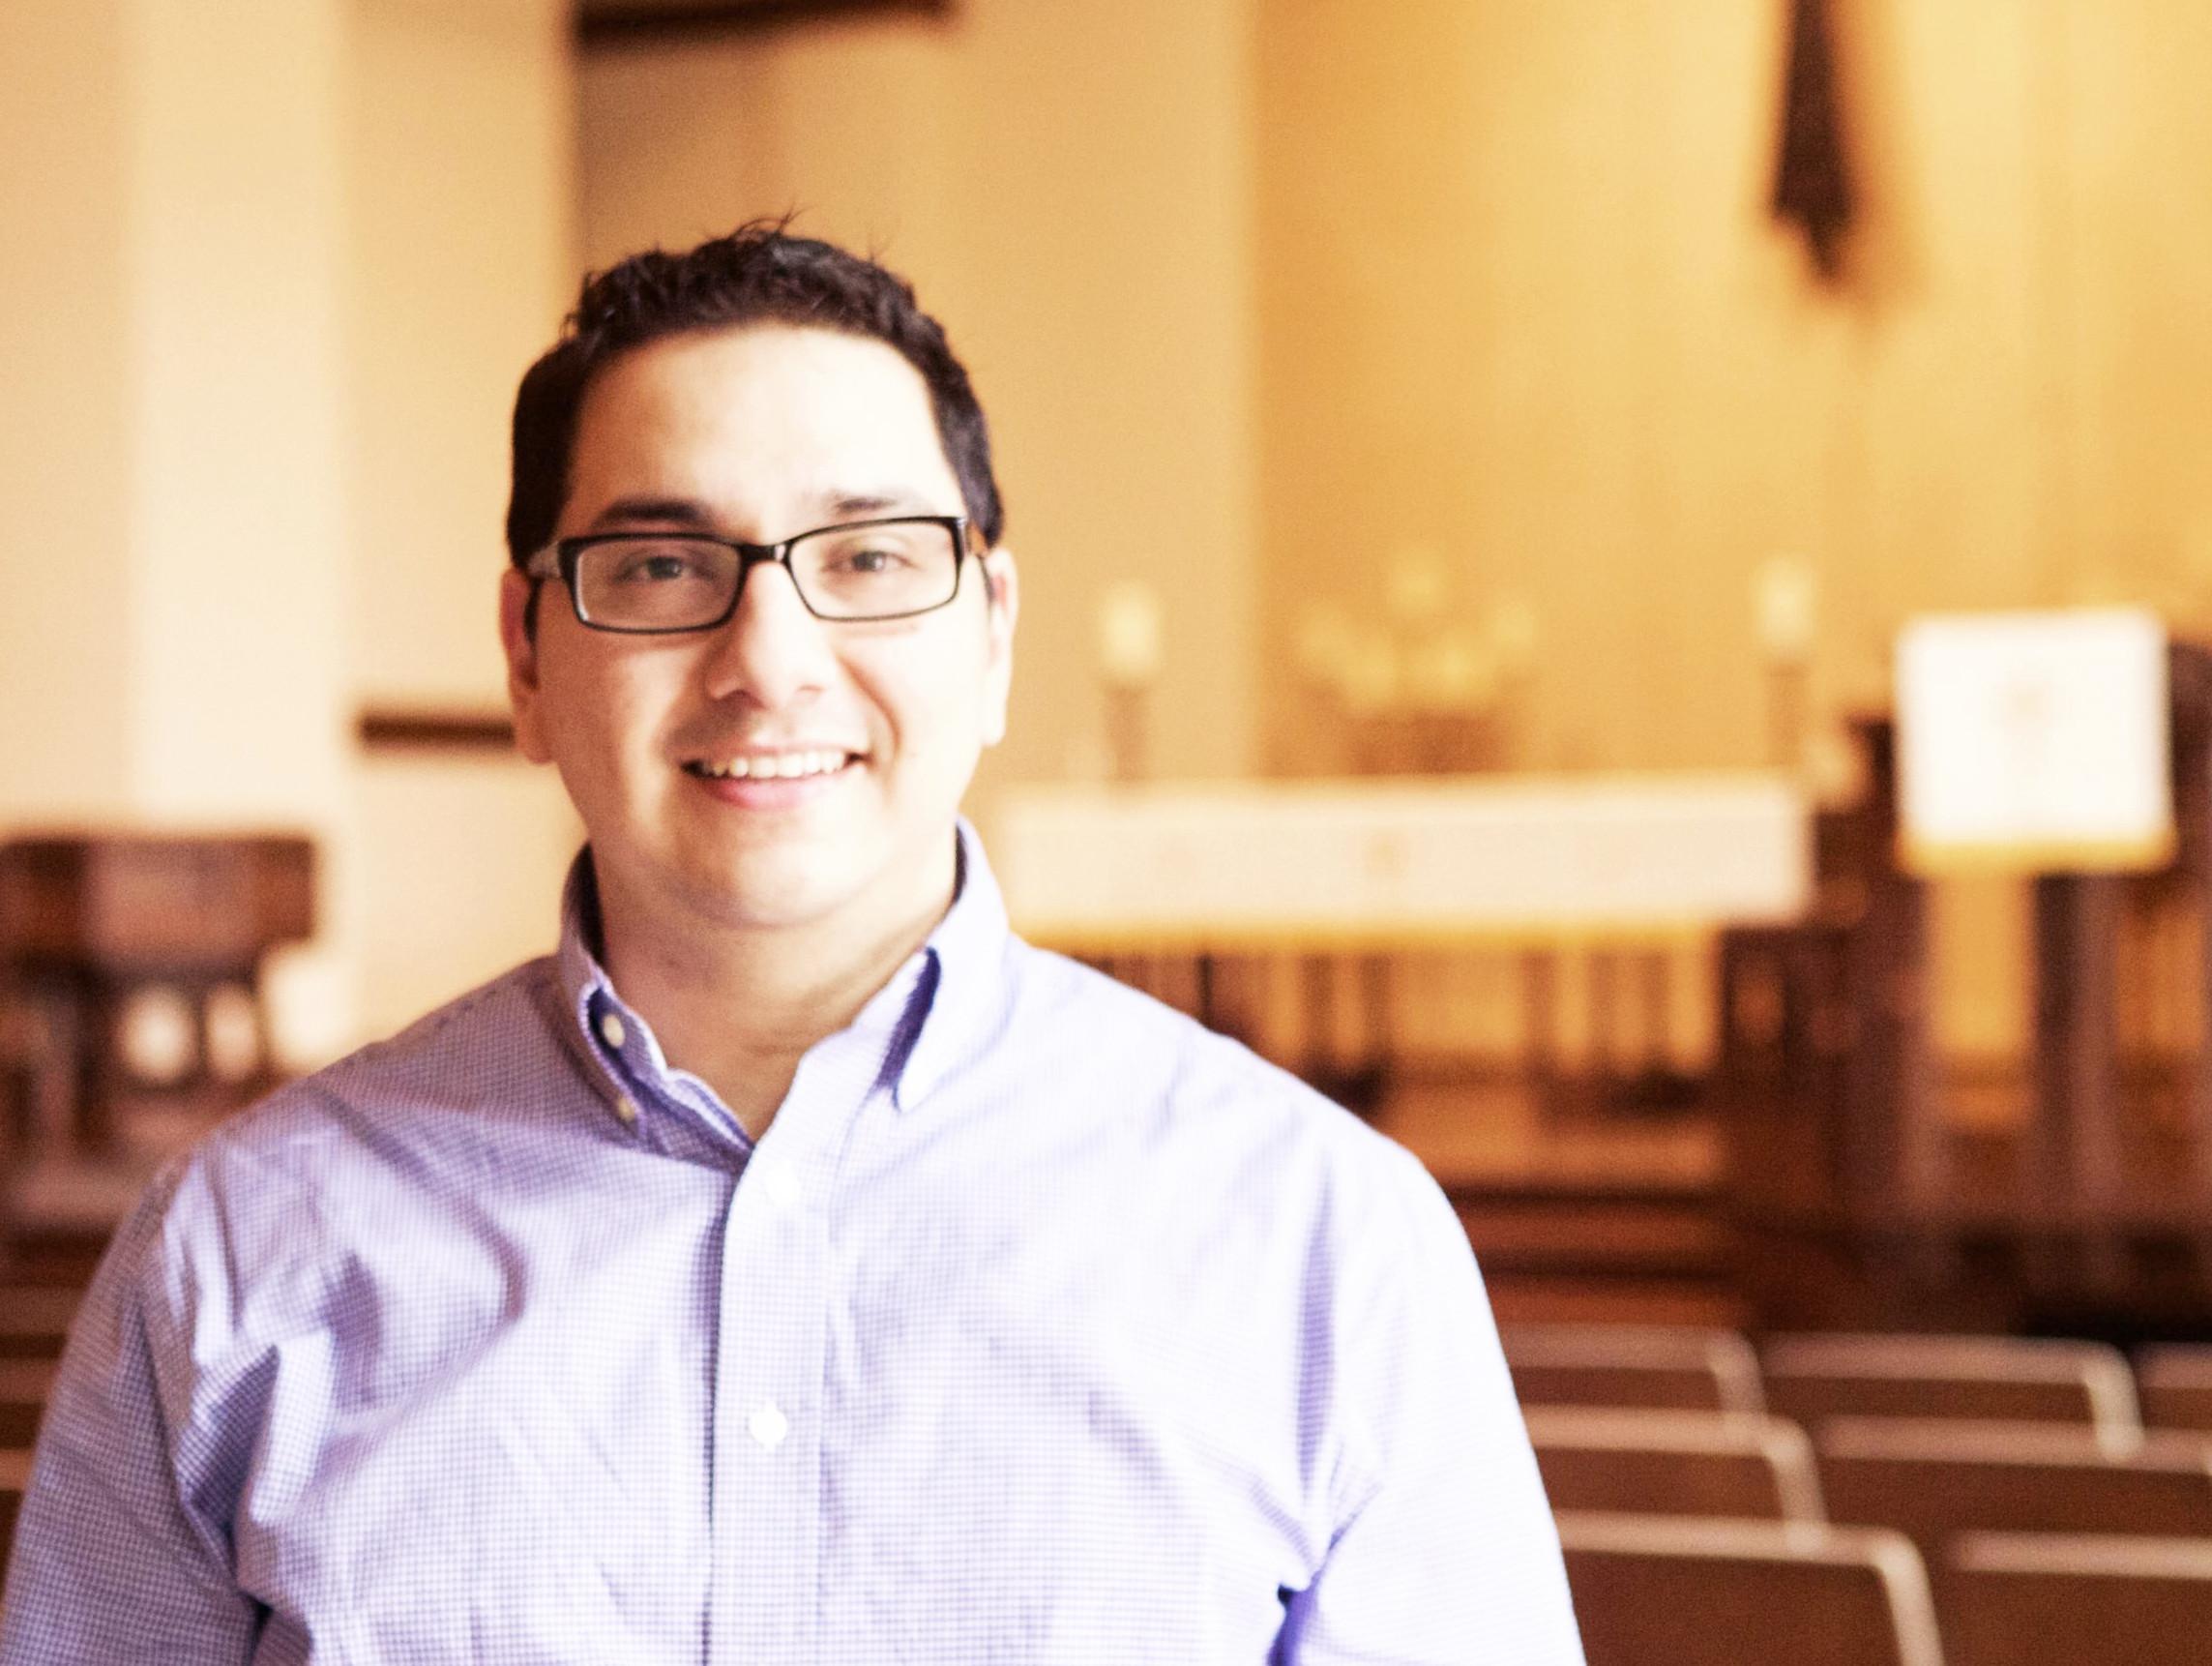 Jaime Jiménez, Primera generación Mexicano, Christ the King, Houston, TX